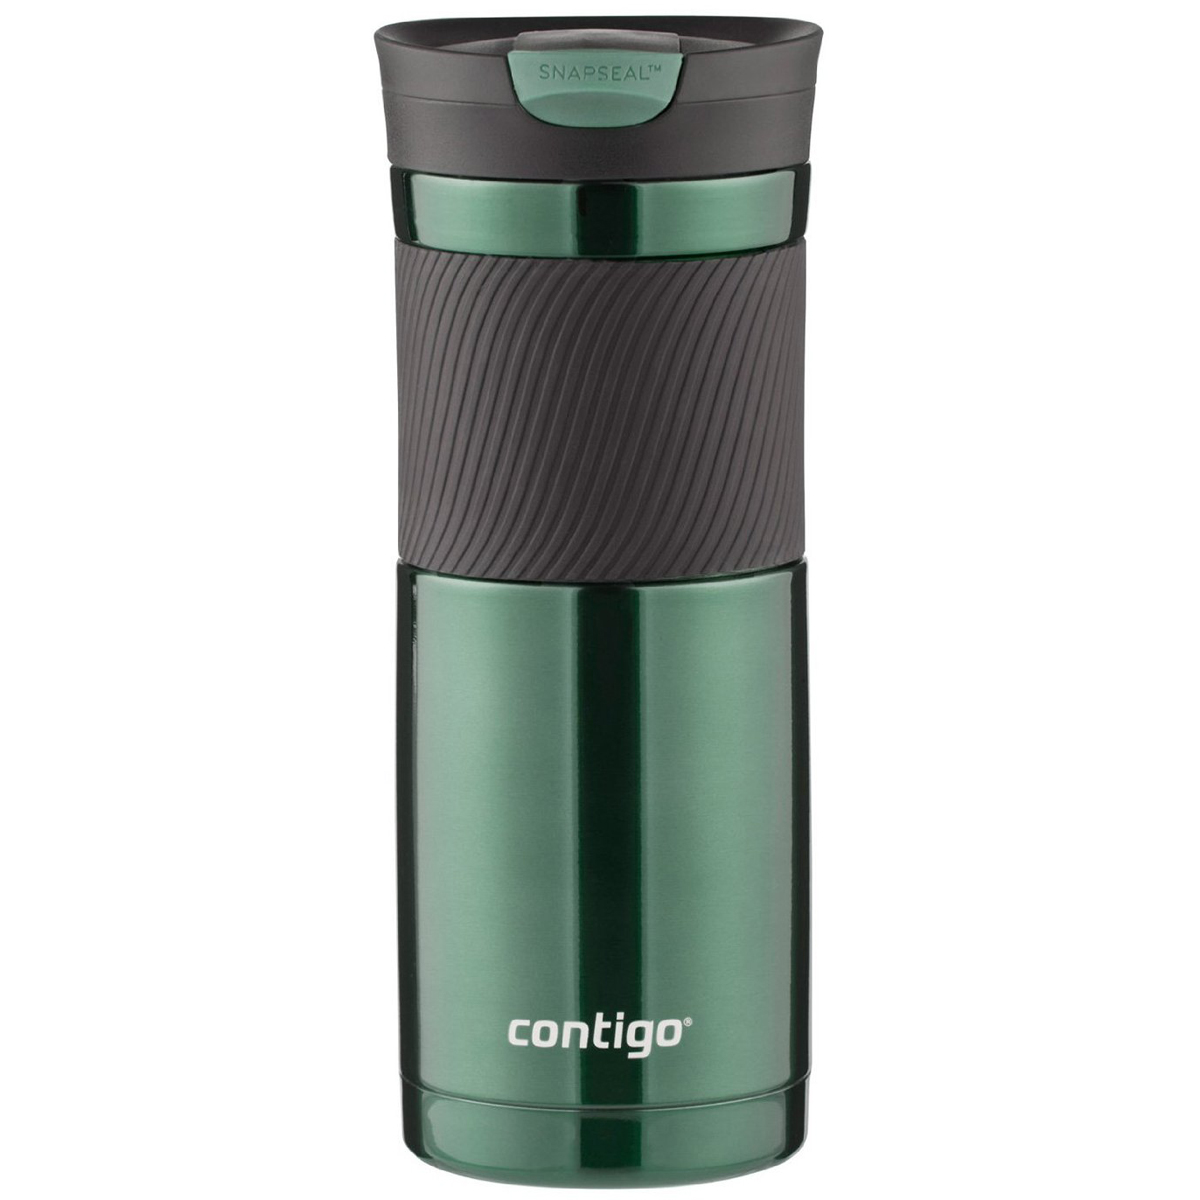 Contigo-20-oz-Byron-SnapSeal-Stainless-Steel-Insulated-Travel-Mug